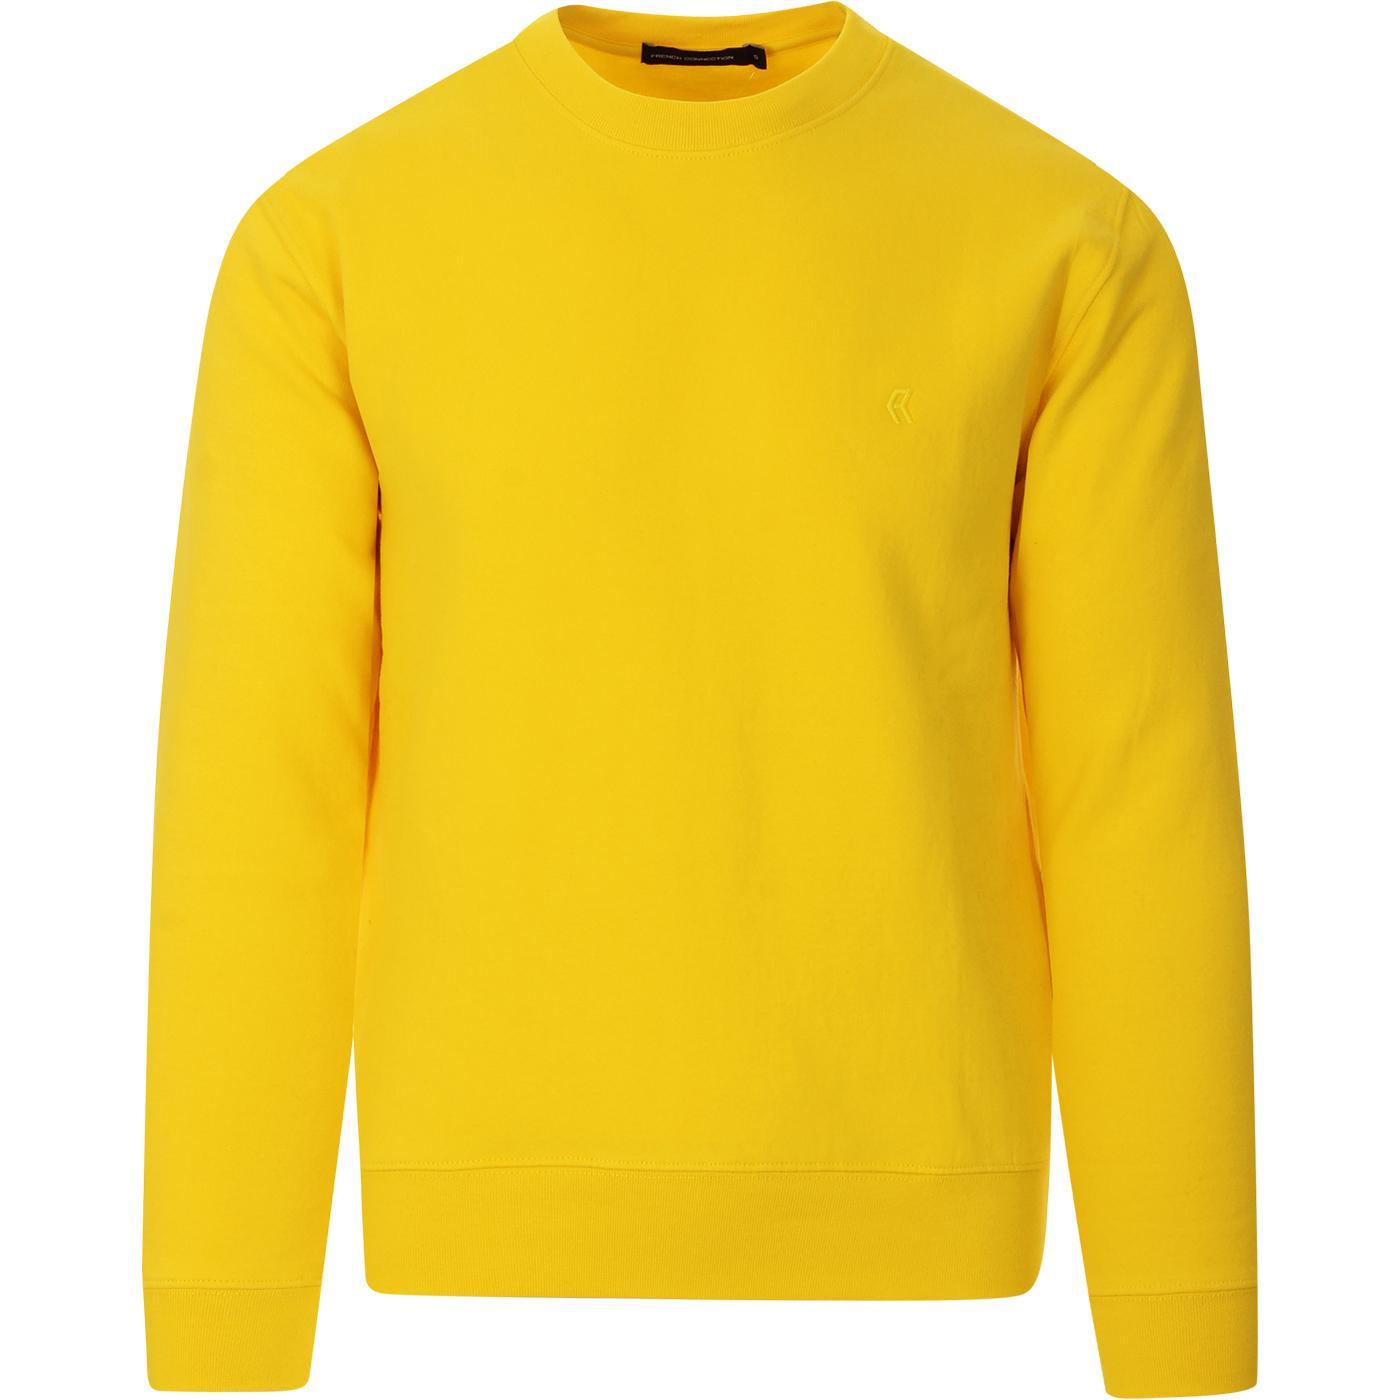 Sunday FRENCH CONNECTION Retro Sweatshirt (CY)